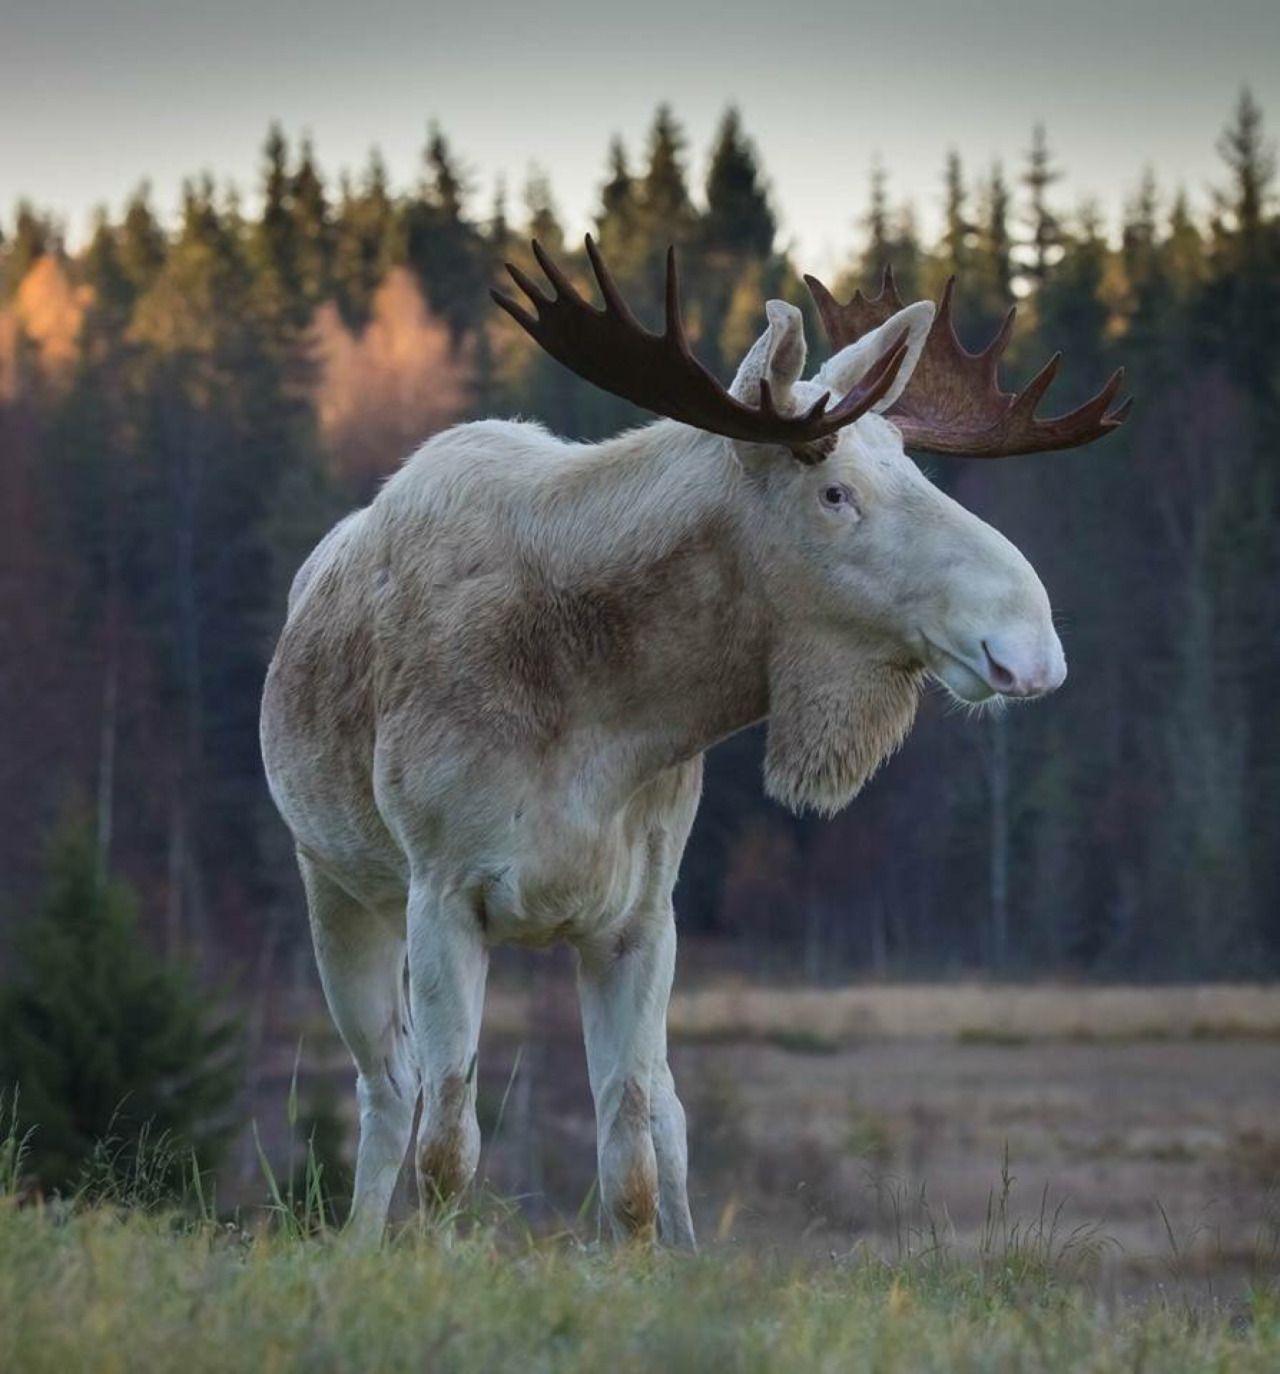 hammerovthor Moose from Värmland, Sweden (With images